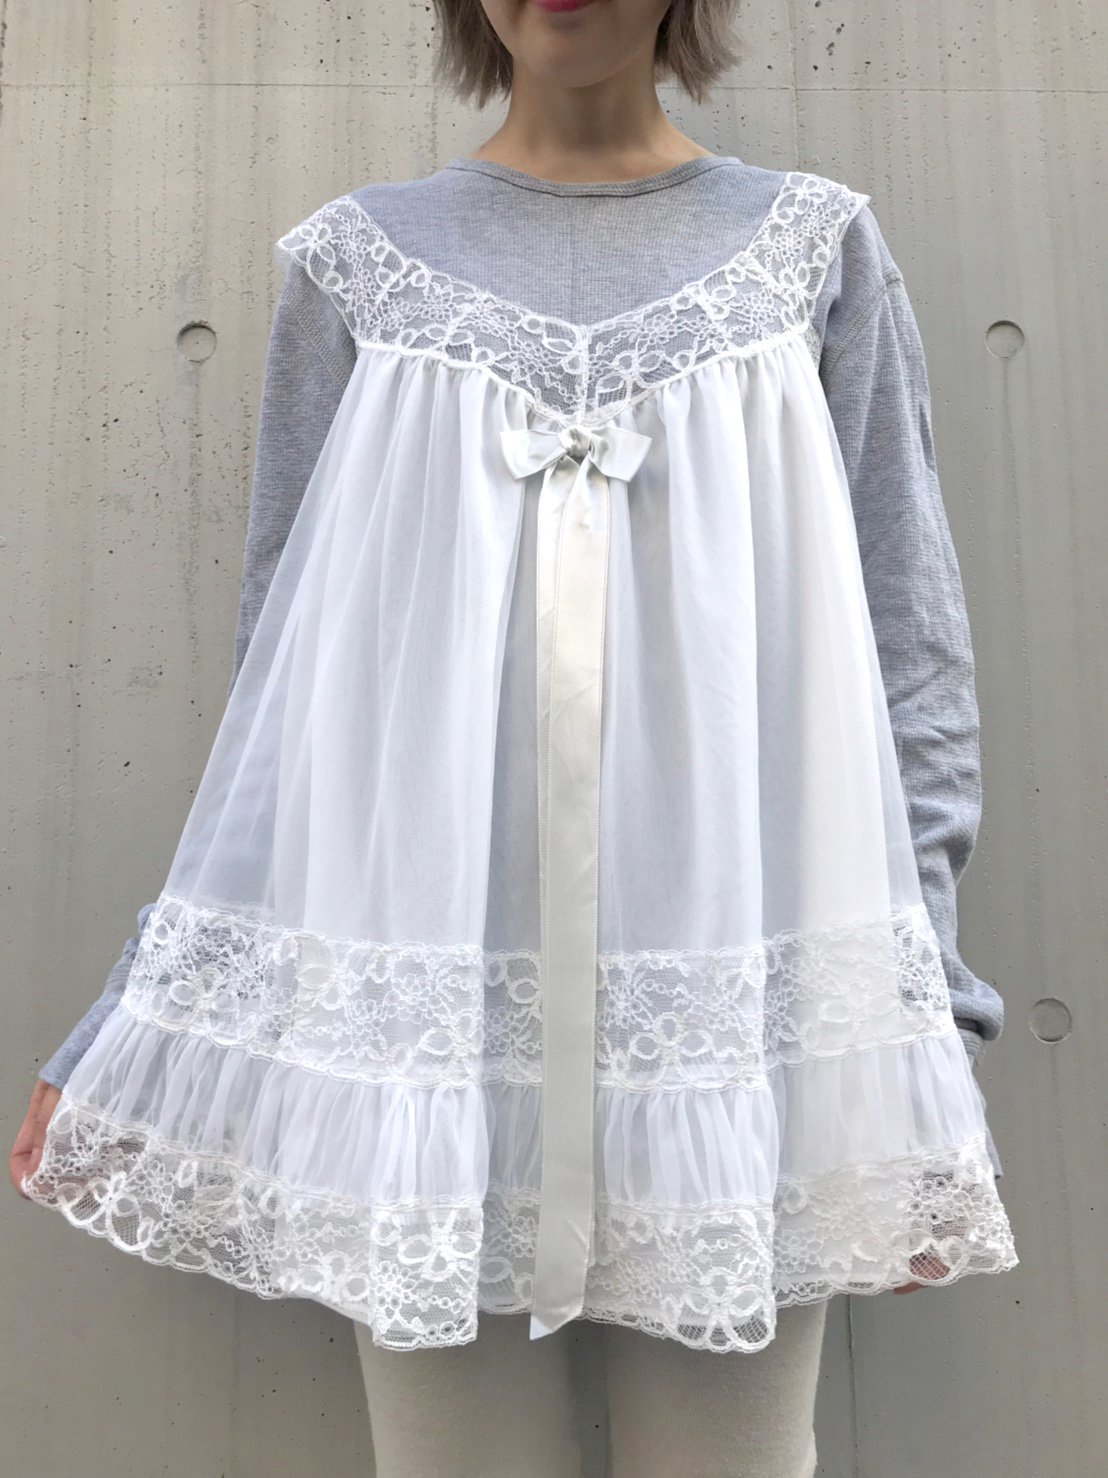 ribbon lace white lingerie